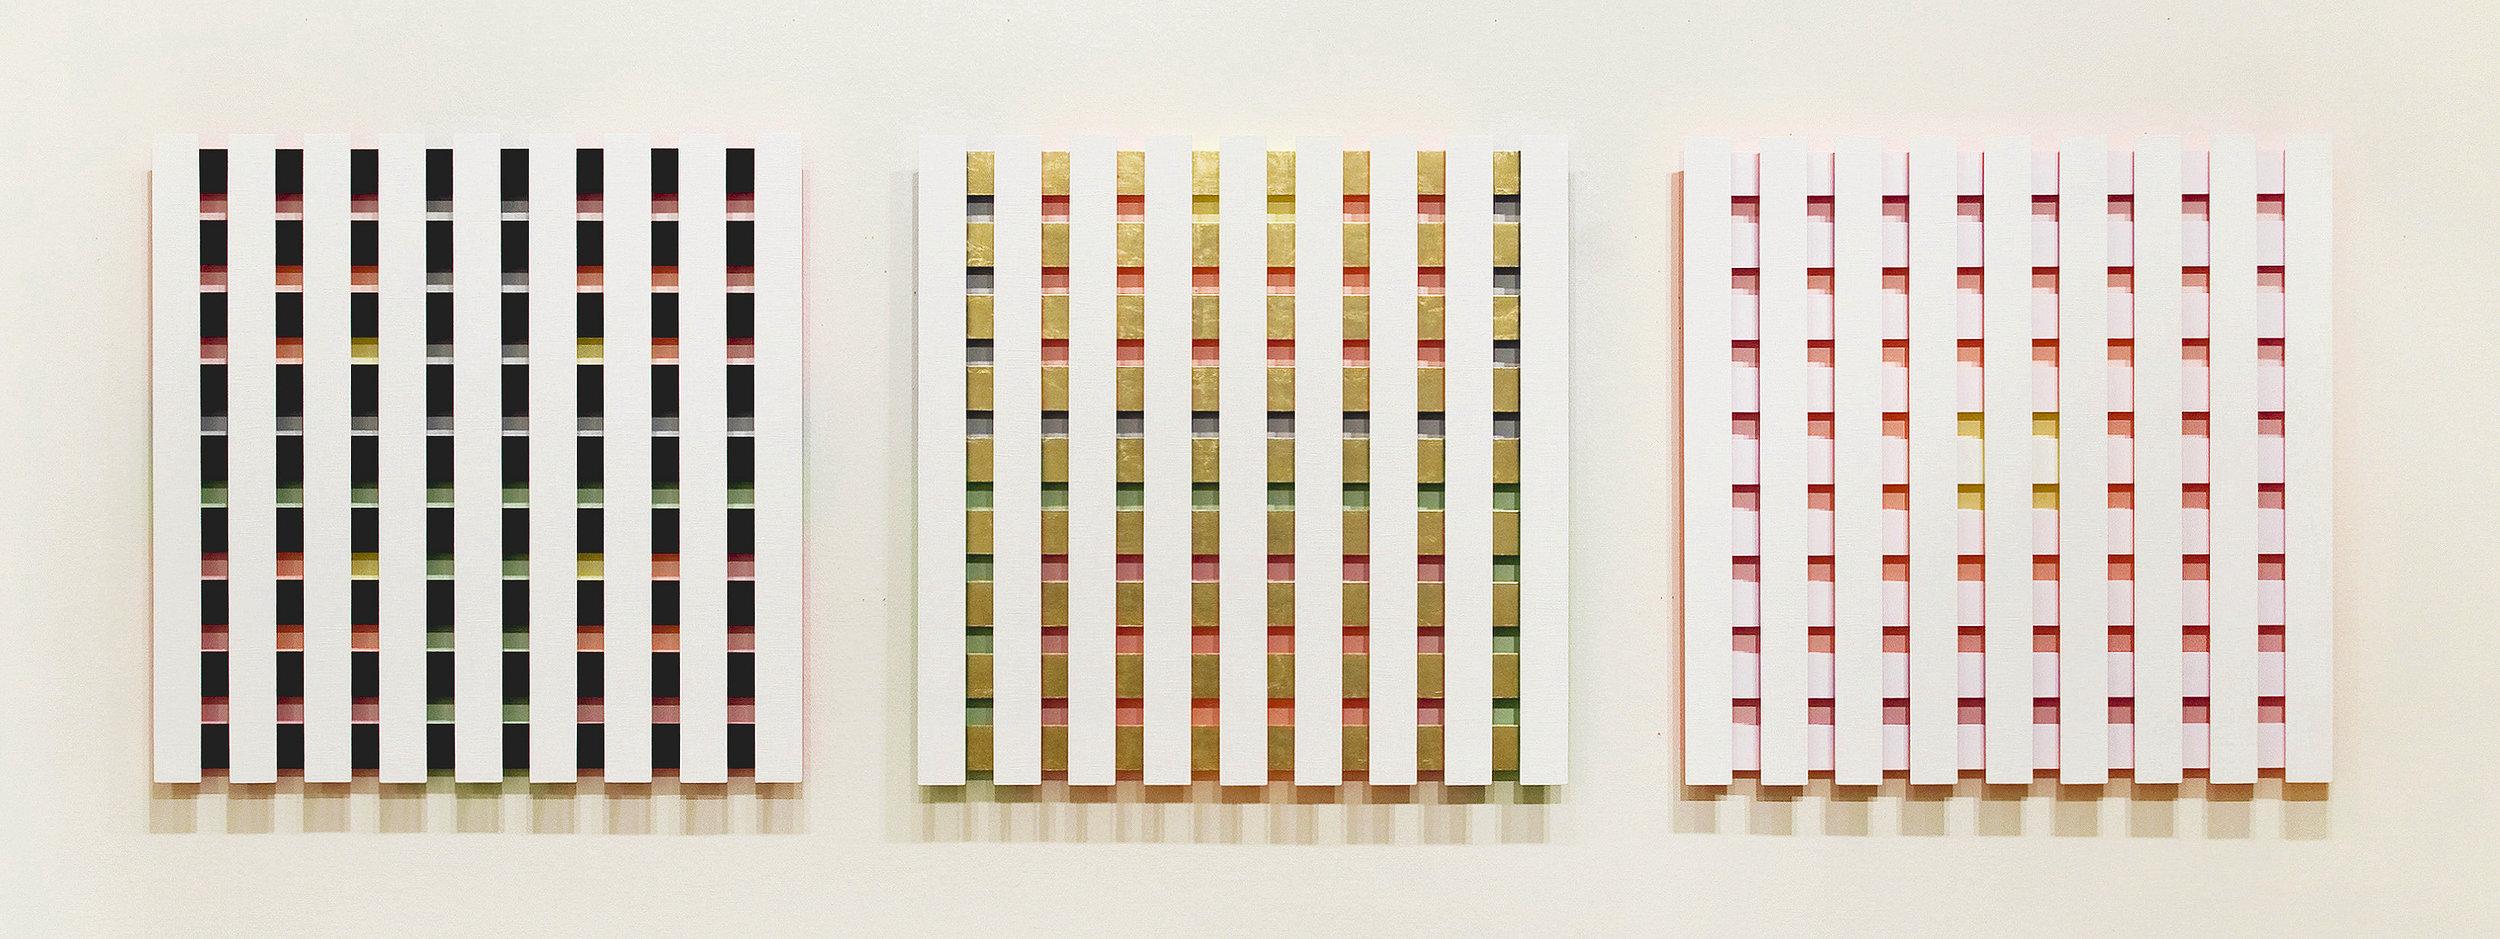 2a akril, les, 121 x 373 cm, 2008-9.jpg